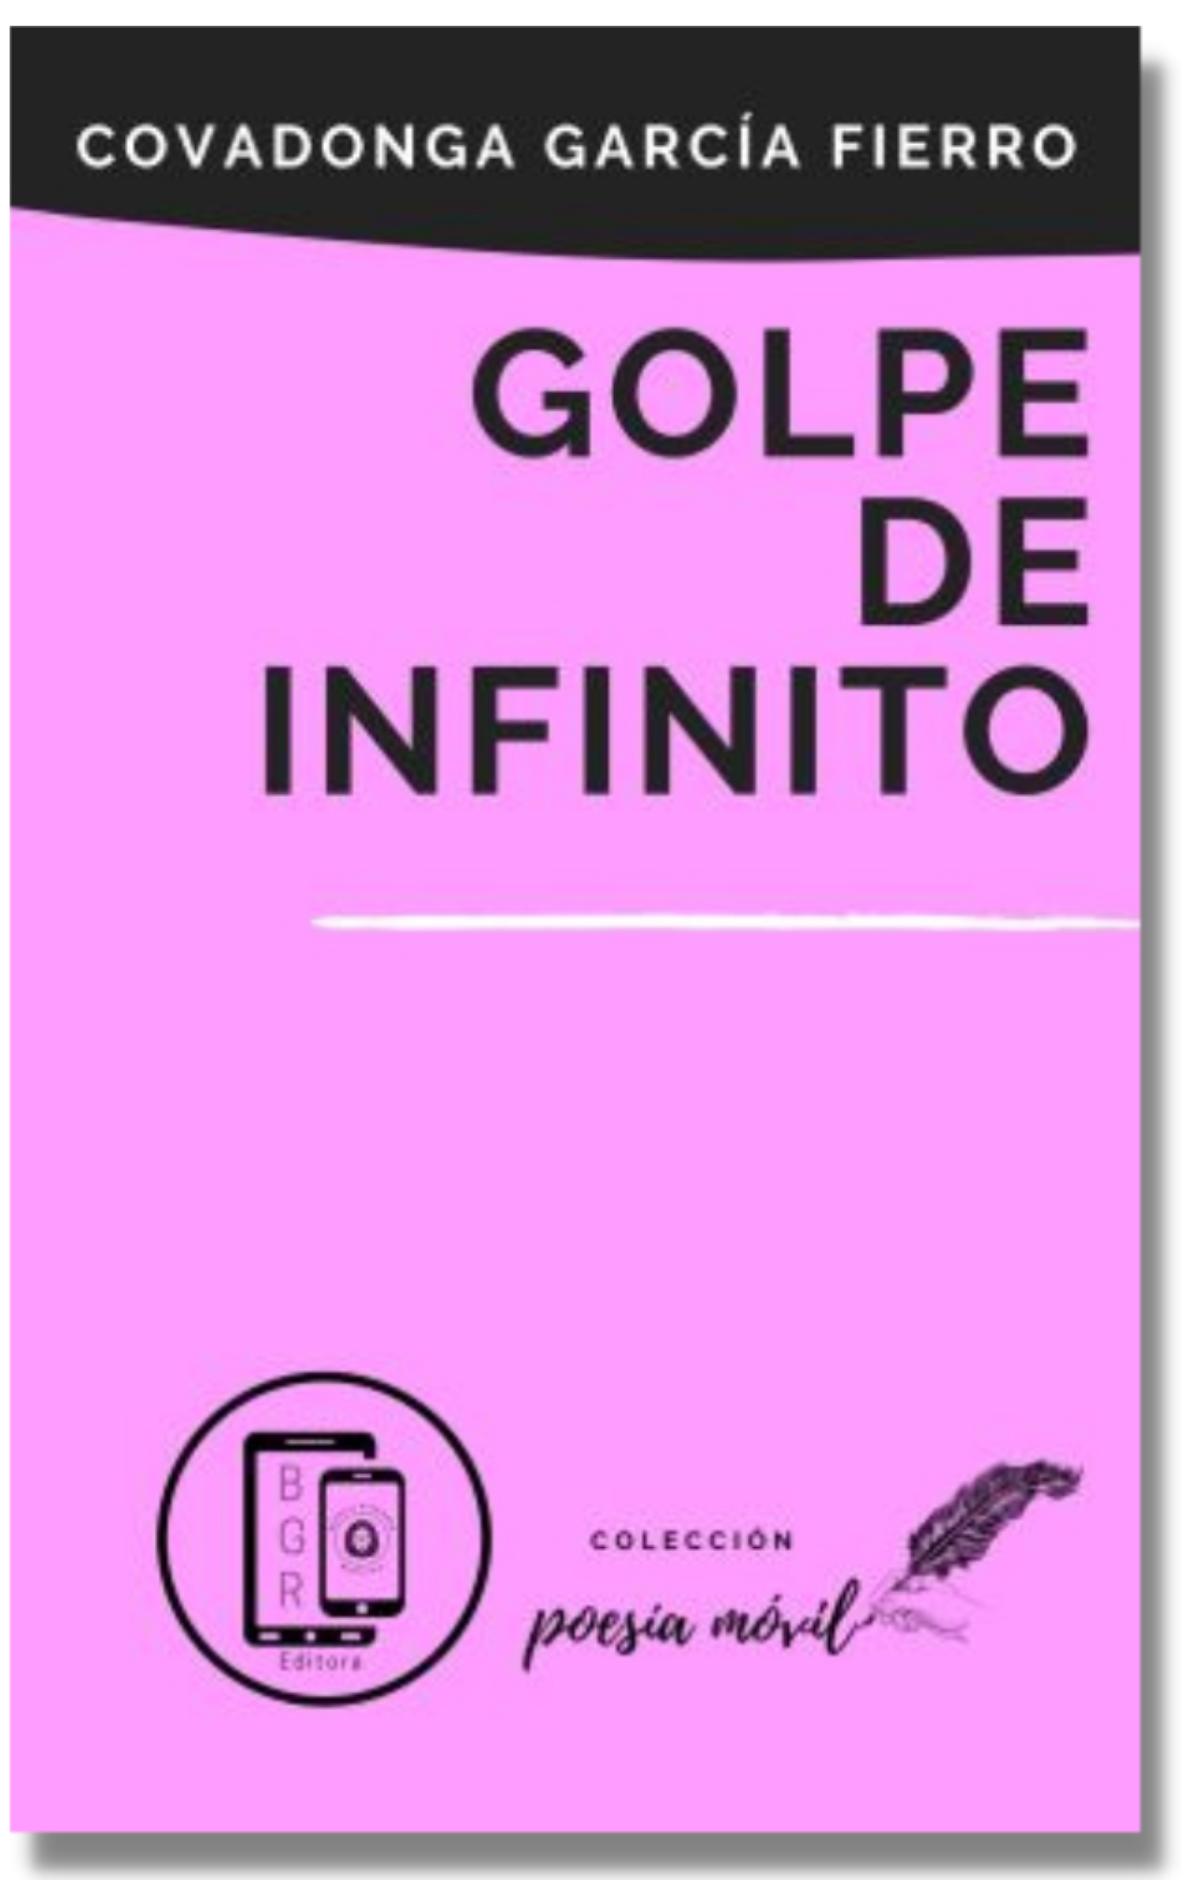 Golpe de infinito_BGR Editora_